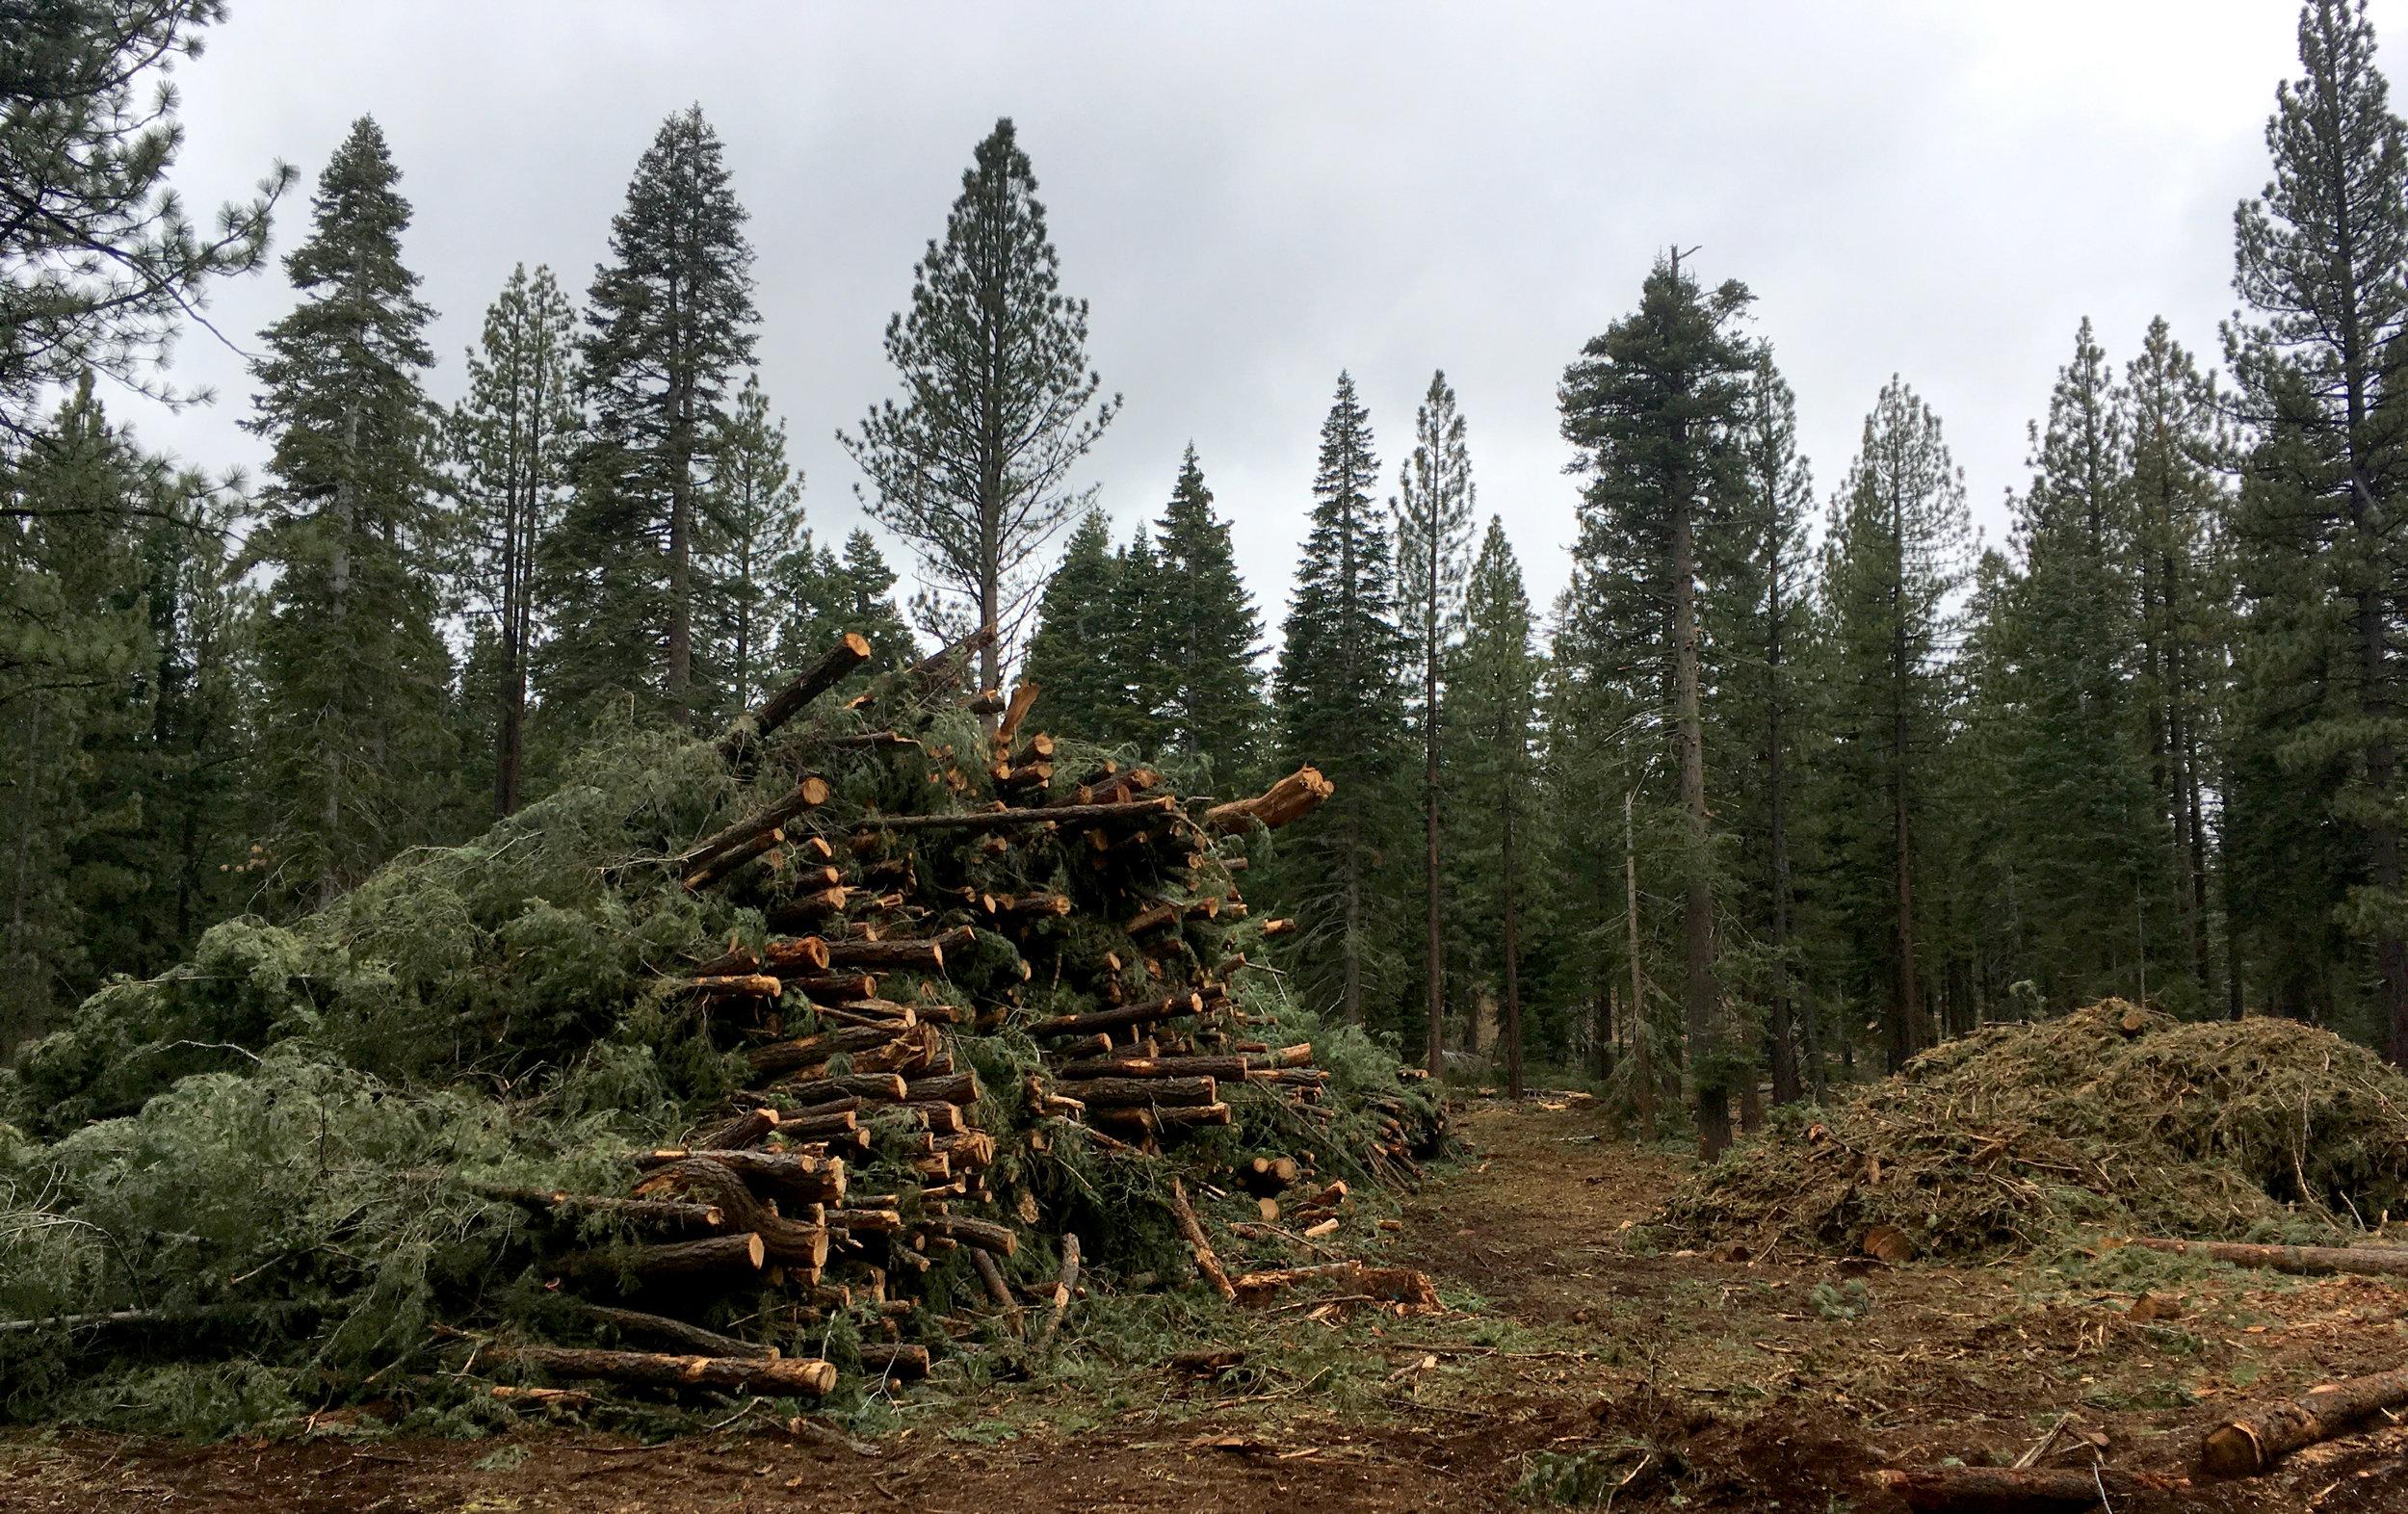 sagehen_trees_logging.jpg